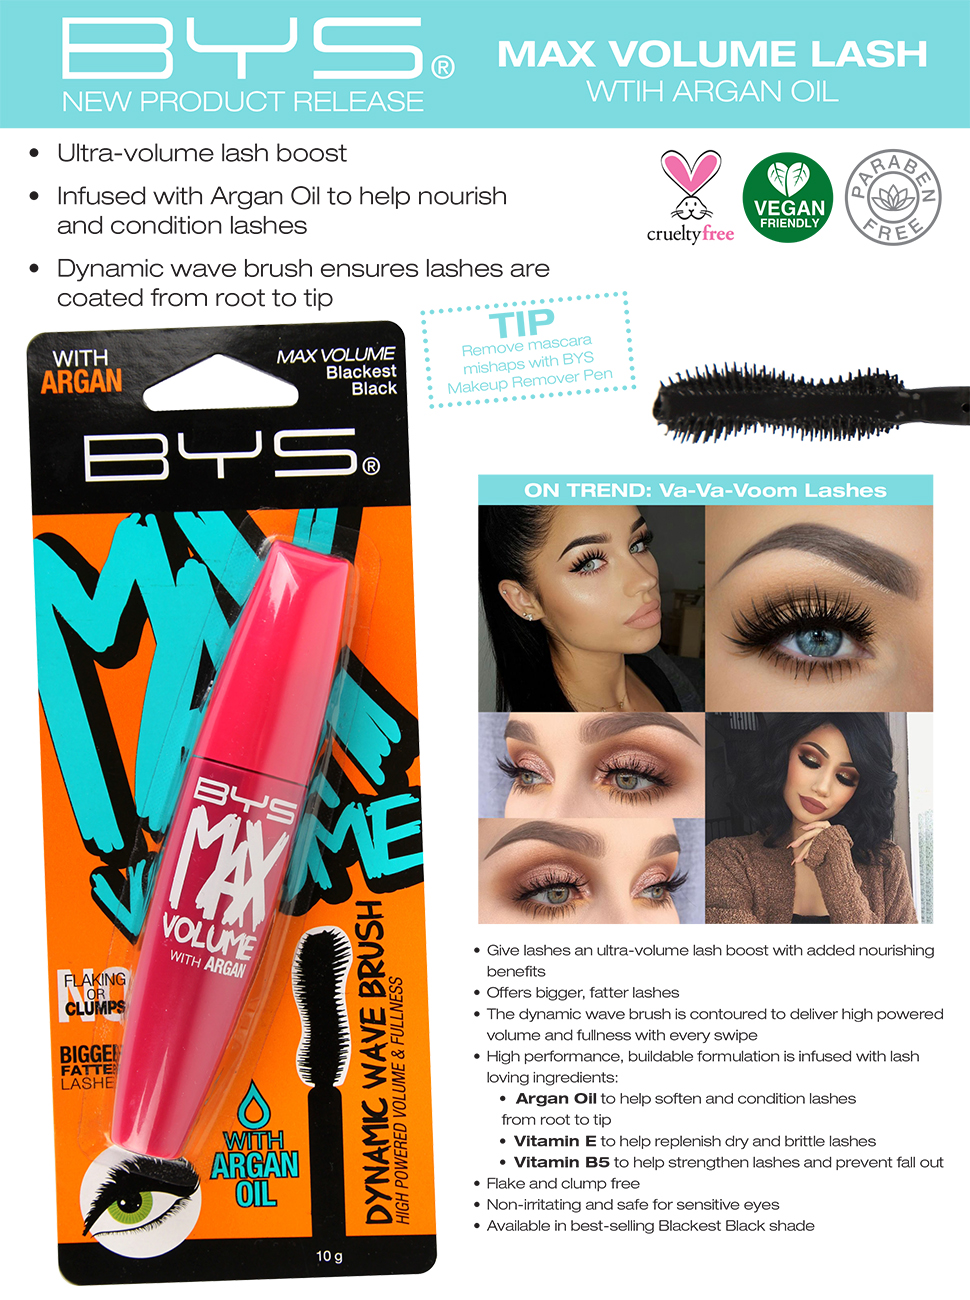 Mascara Max Volume Lash With Argan Oil Blackest Black - lashes volume boost nourishing dynamic